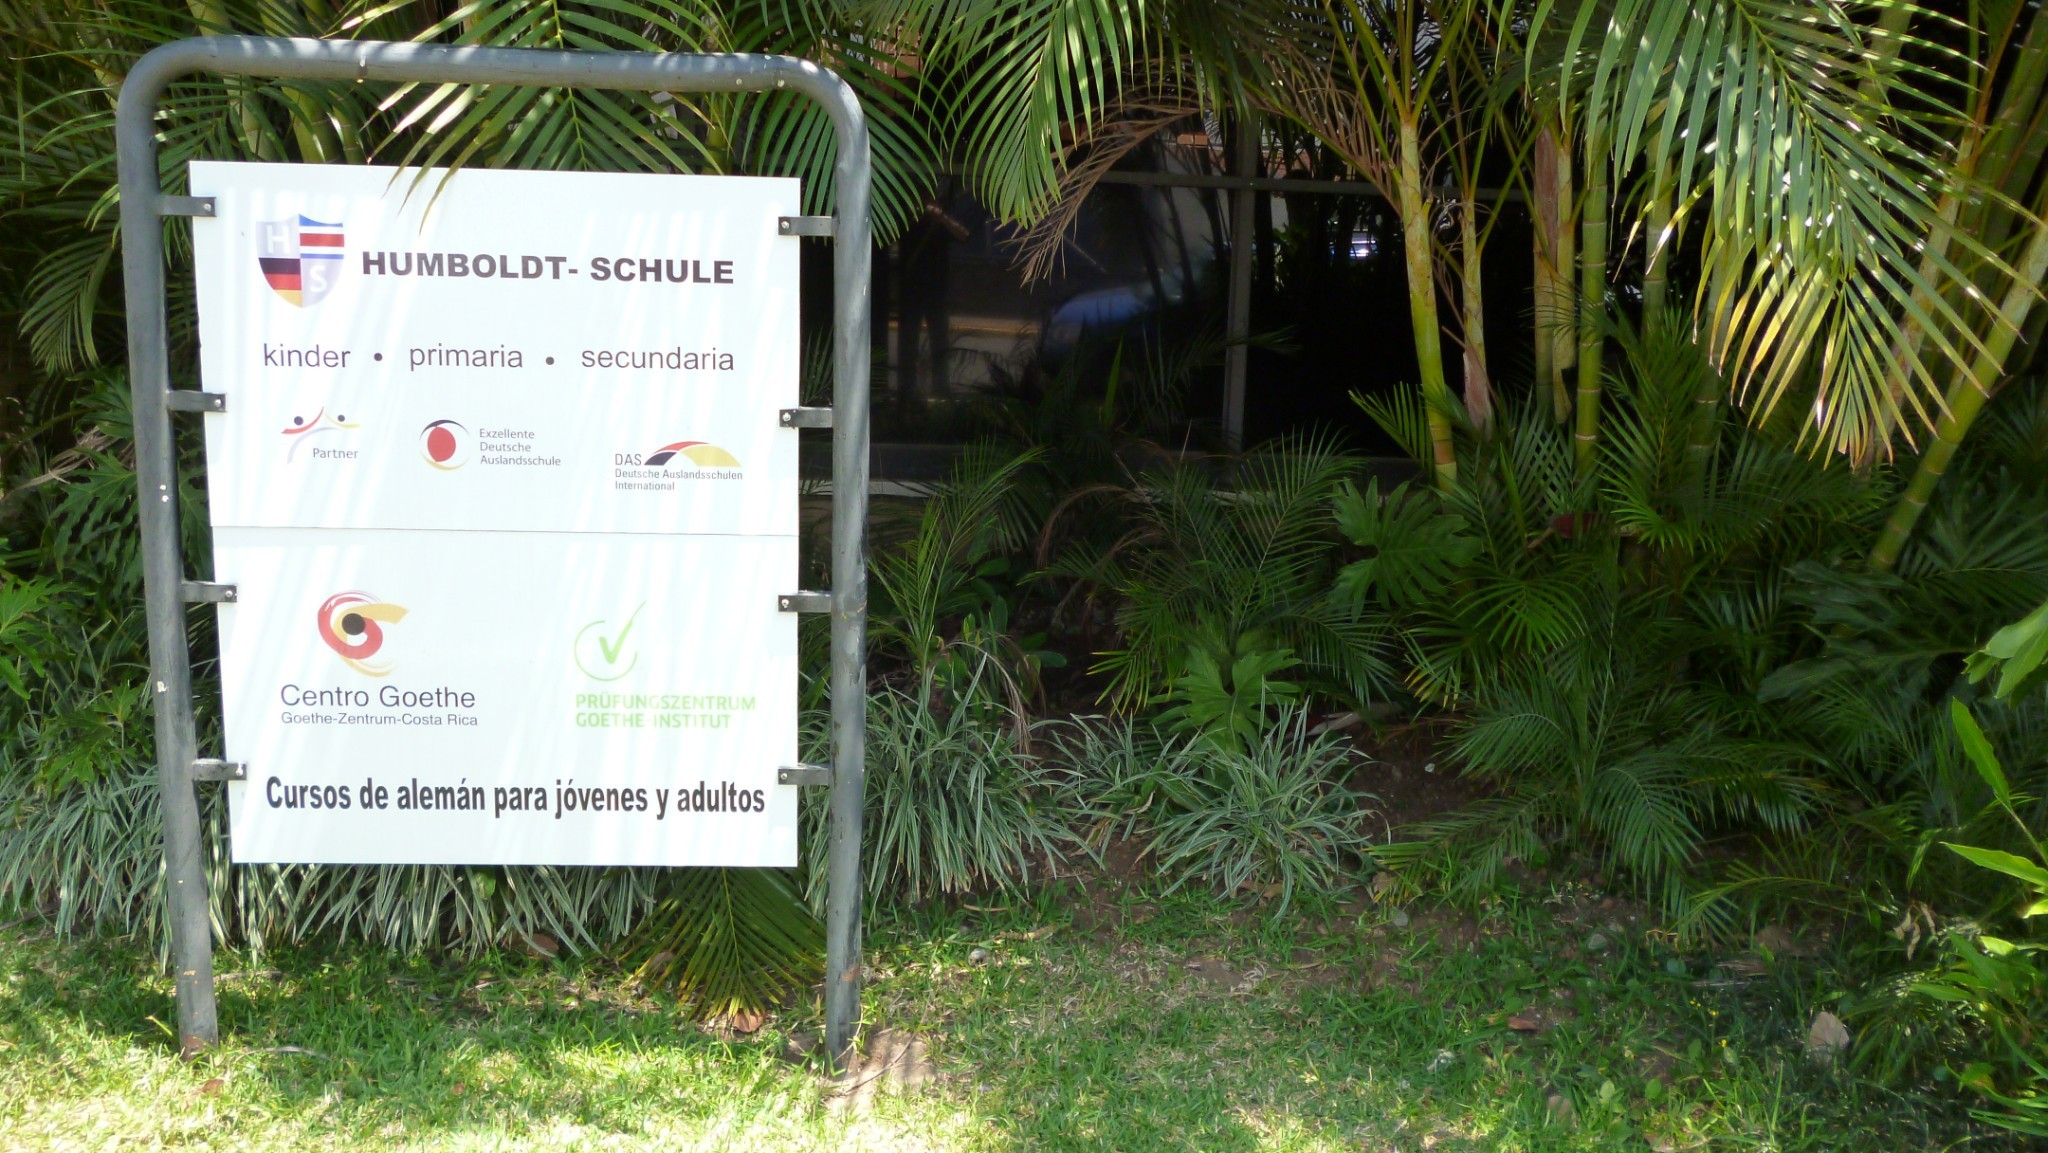 Calendario 2019 Para Imprimir Costa Rica Más Recientes Galera – Centro Goethe Of Calendario 2019 Para Imprimir Costa Rica Más Caliente Calendario Cuba A±o 2019